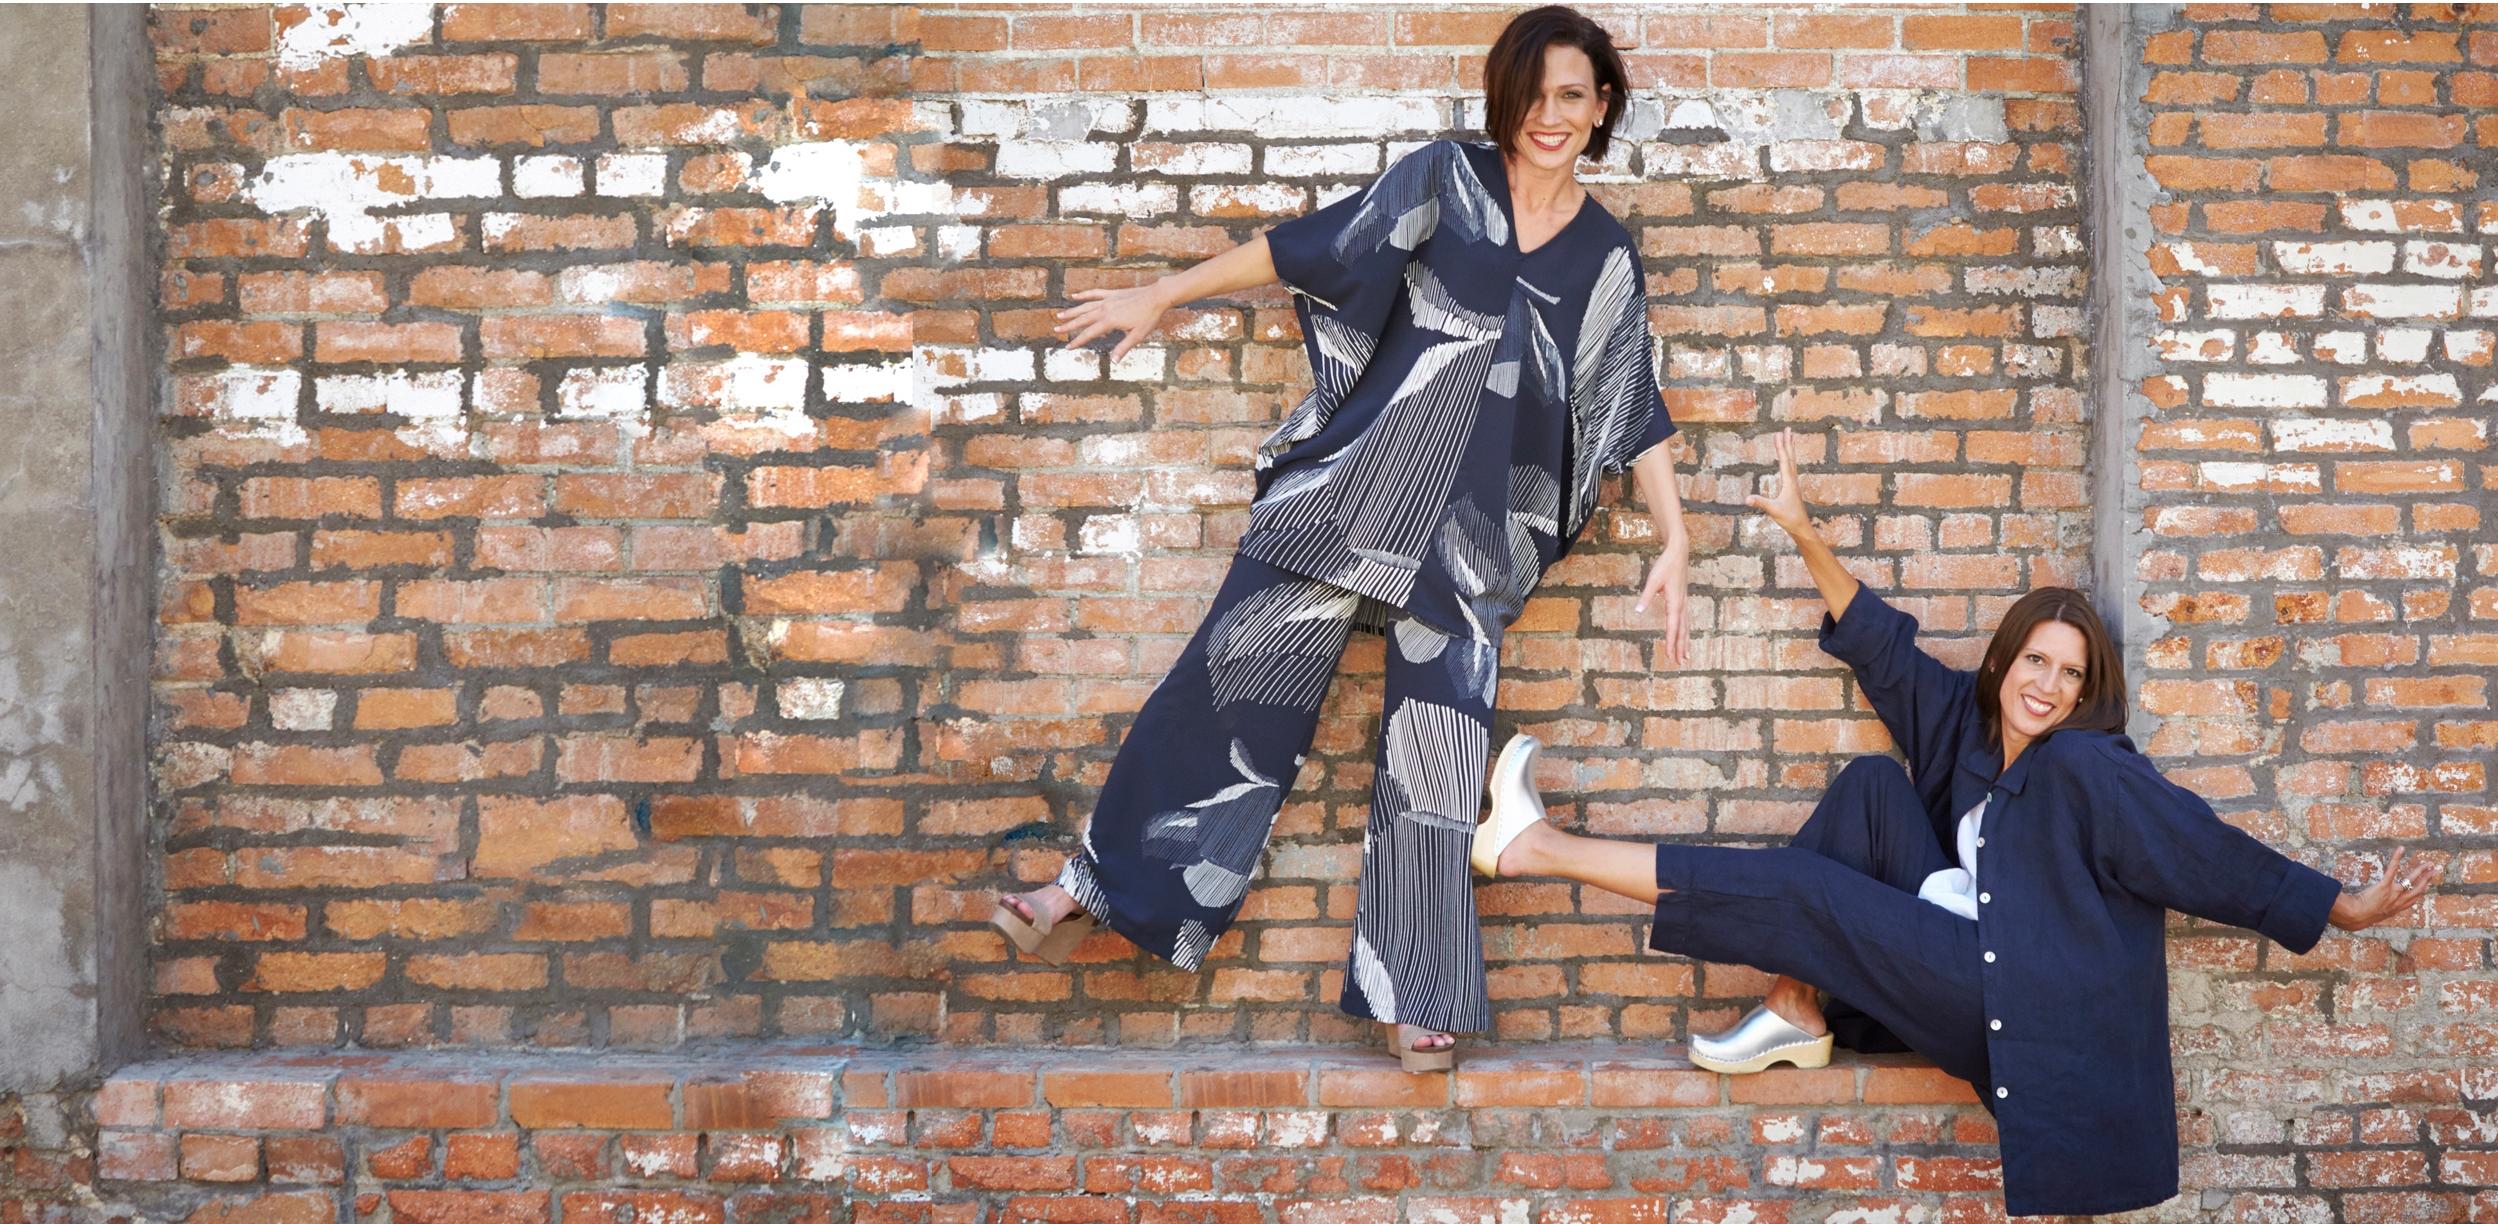 Raquel Tunic, Long Full Pant in lndaco Italian Foglia Print,Mirren Shirt, Capri Pant in Aviator Light Linen